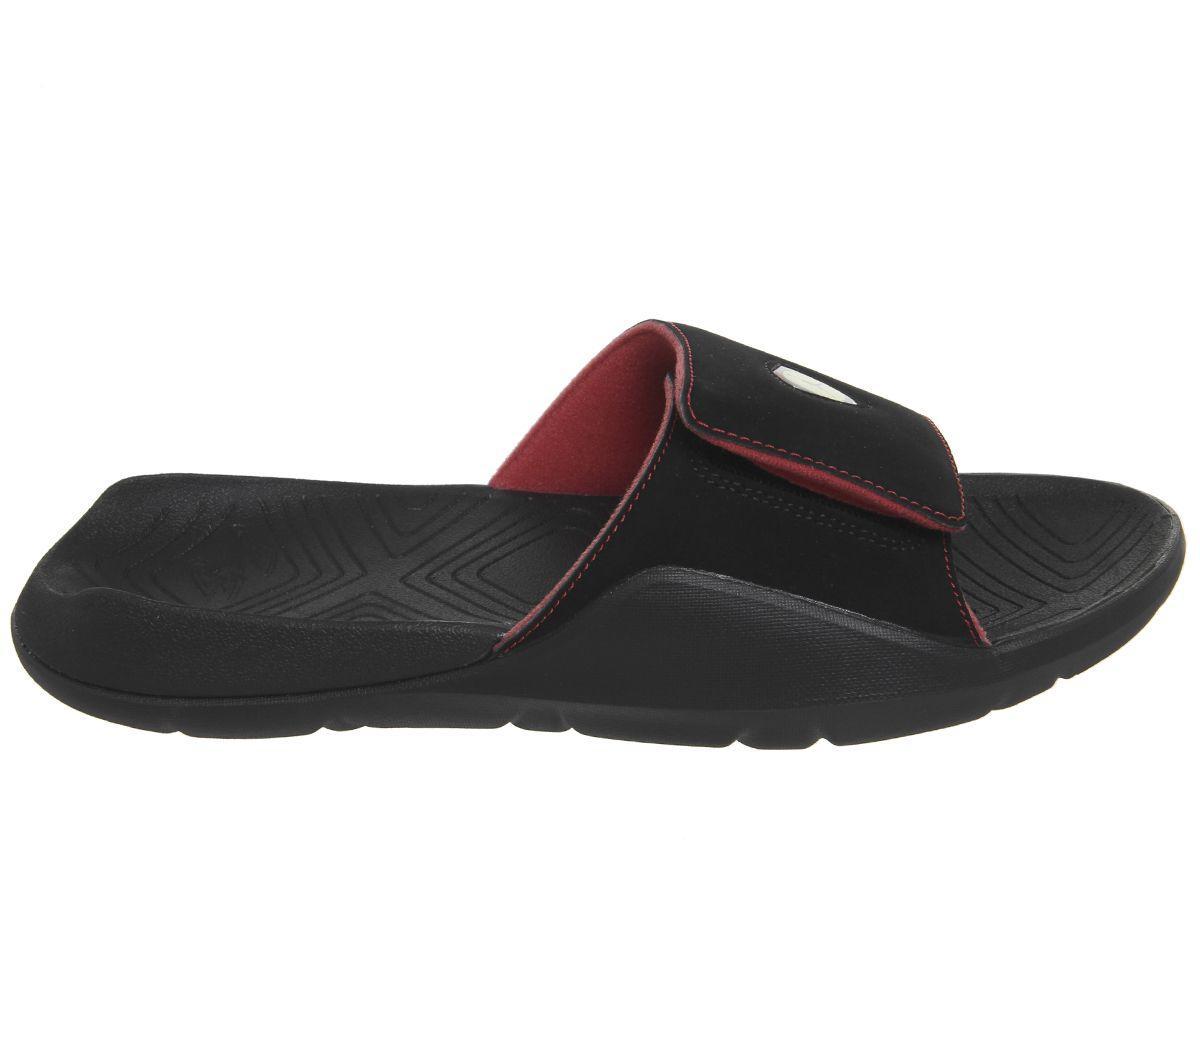 6f60ea20b05a Nike Hydro 7 Slides in Black for Men - Lyst